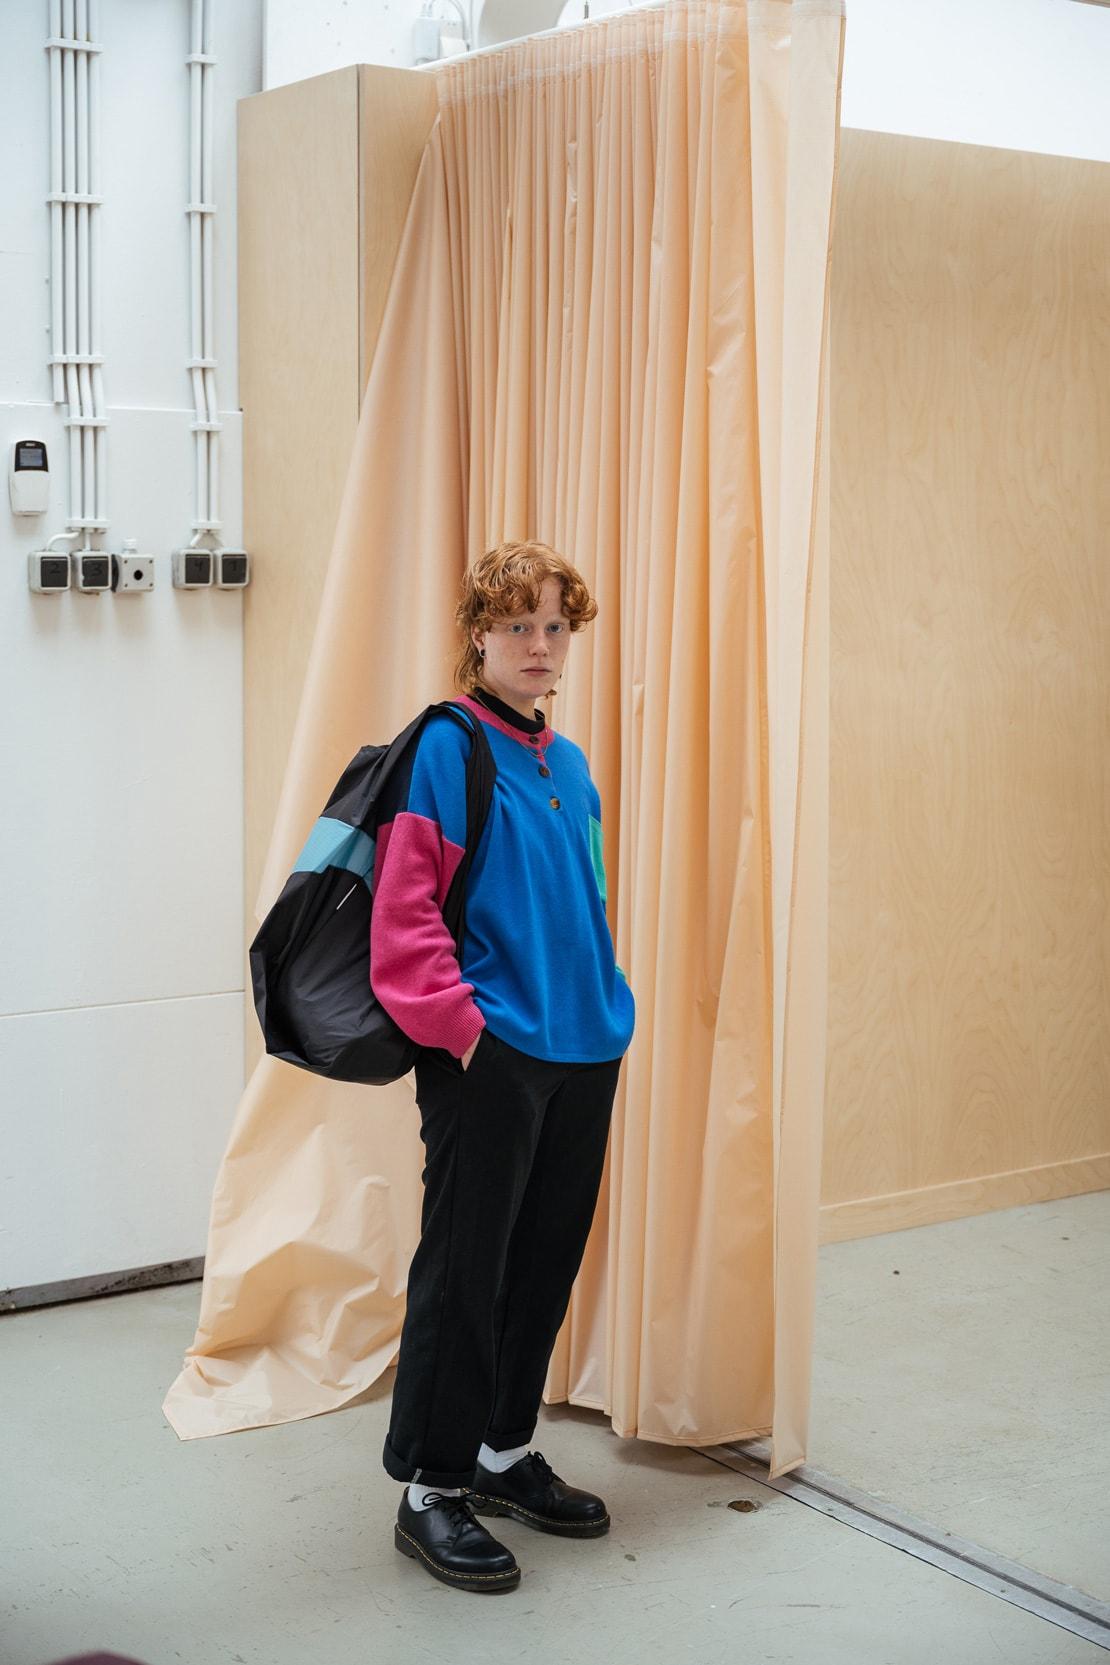 SUSAN BIJL New Shopping Bag Reusable Sustainable Grocery Nylon Rotterdam The Netherlands Dutch Designer